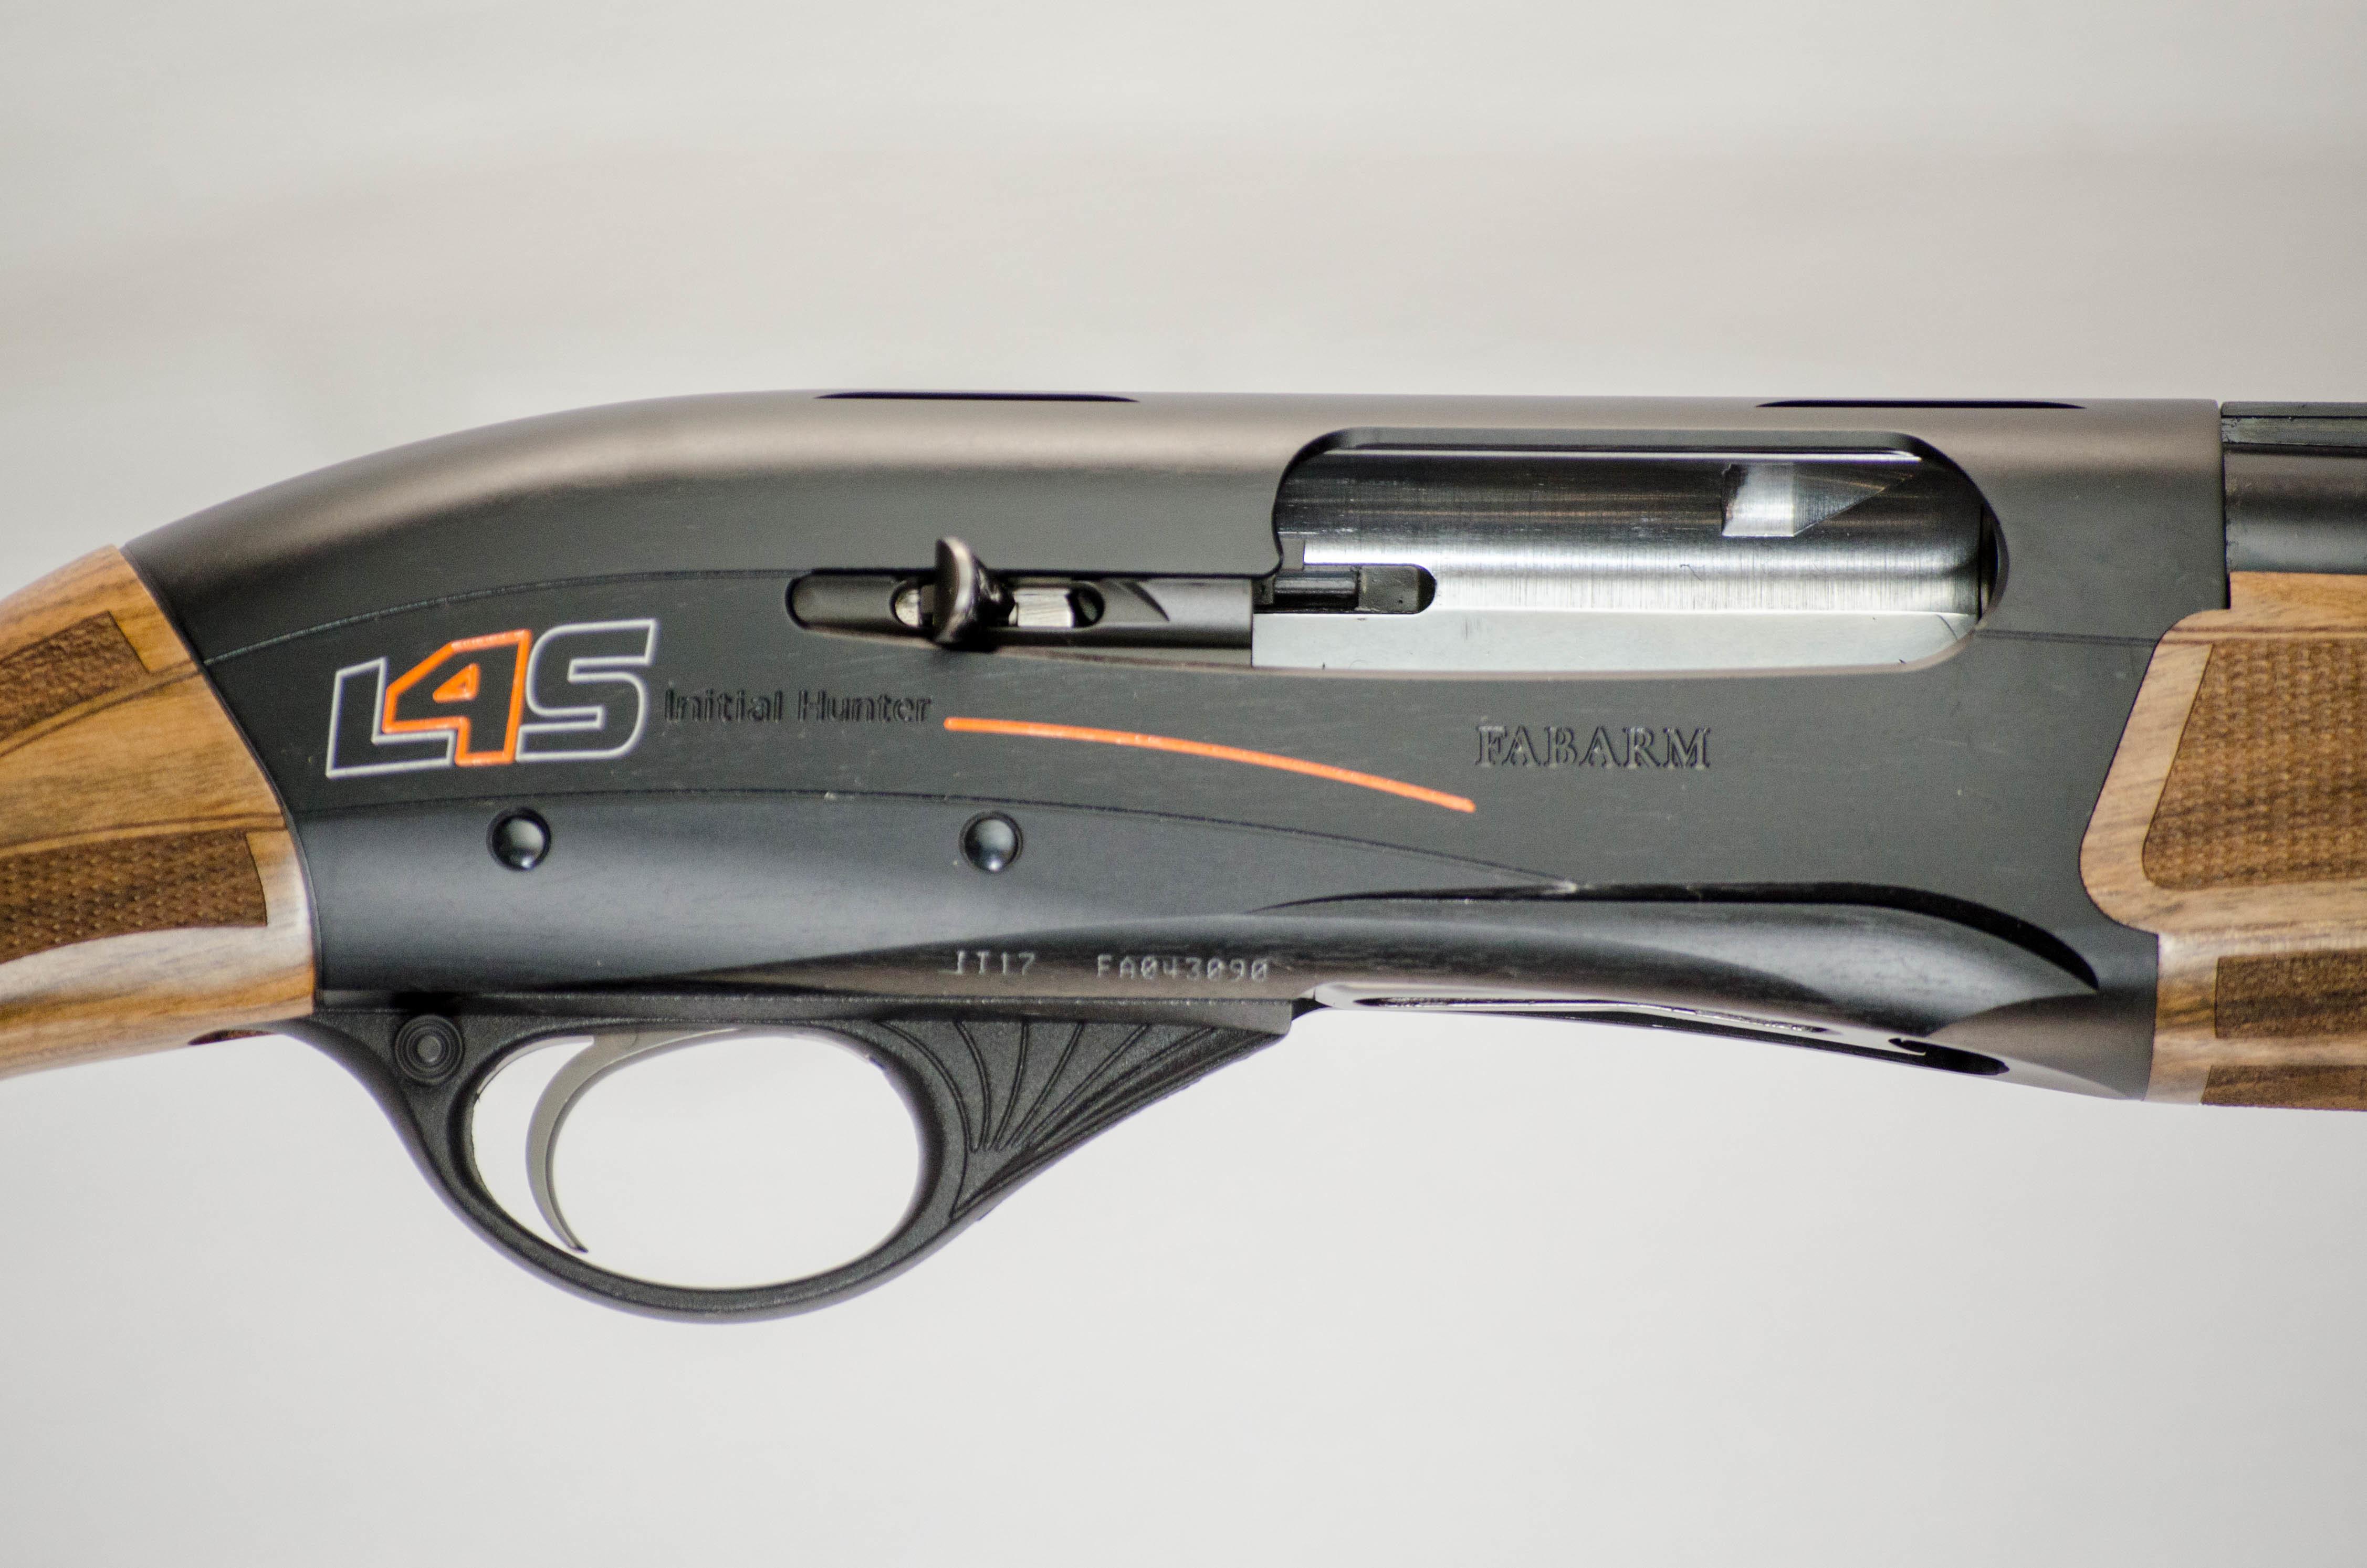 "Fabarm L4S Inital Hunter 12GA 28"" 4313"